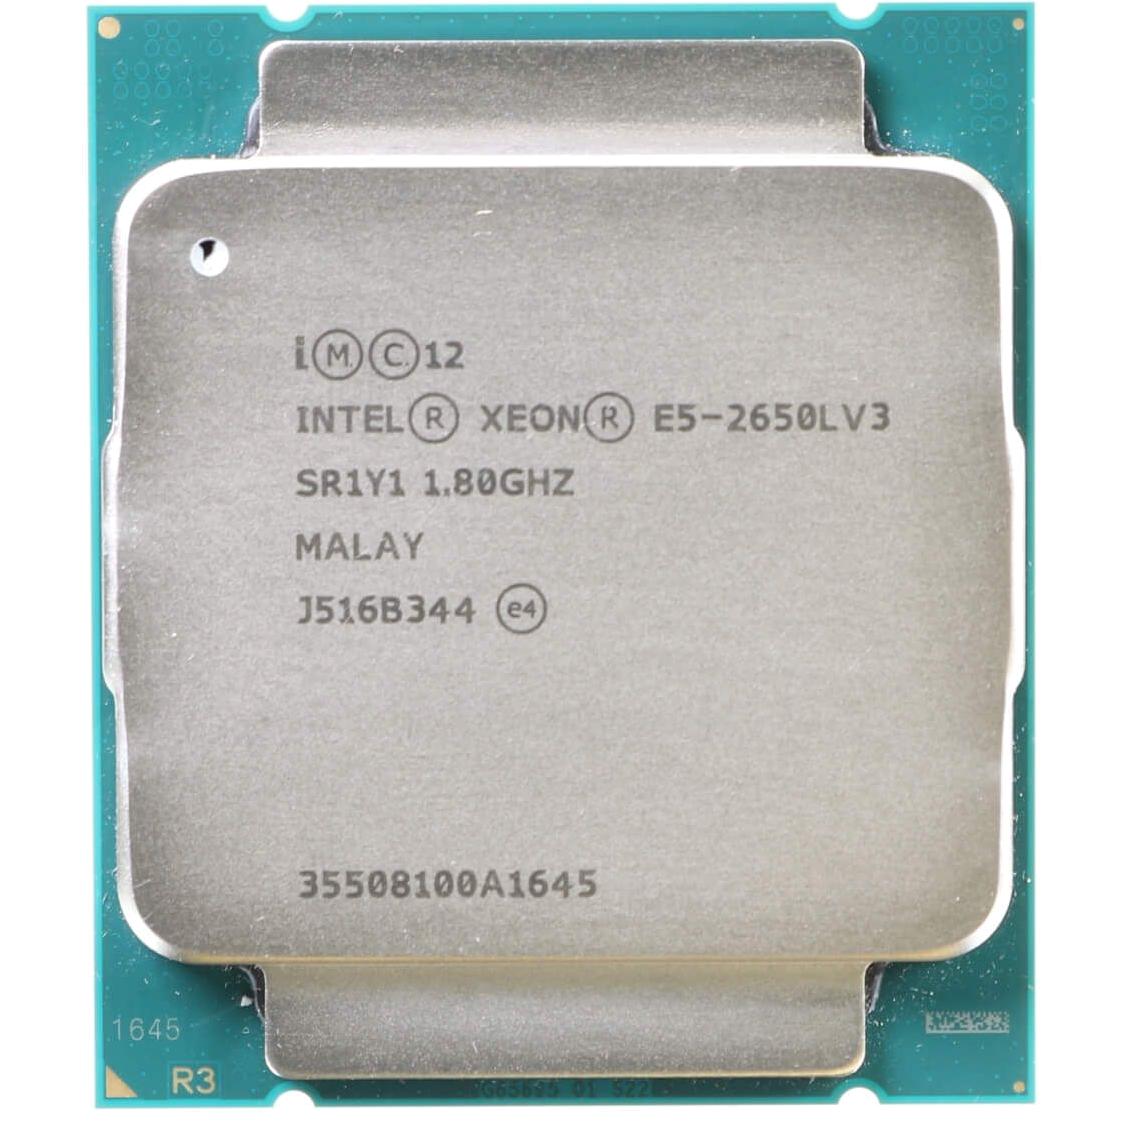 E5-2650LV3